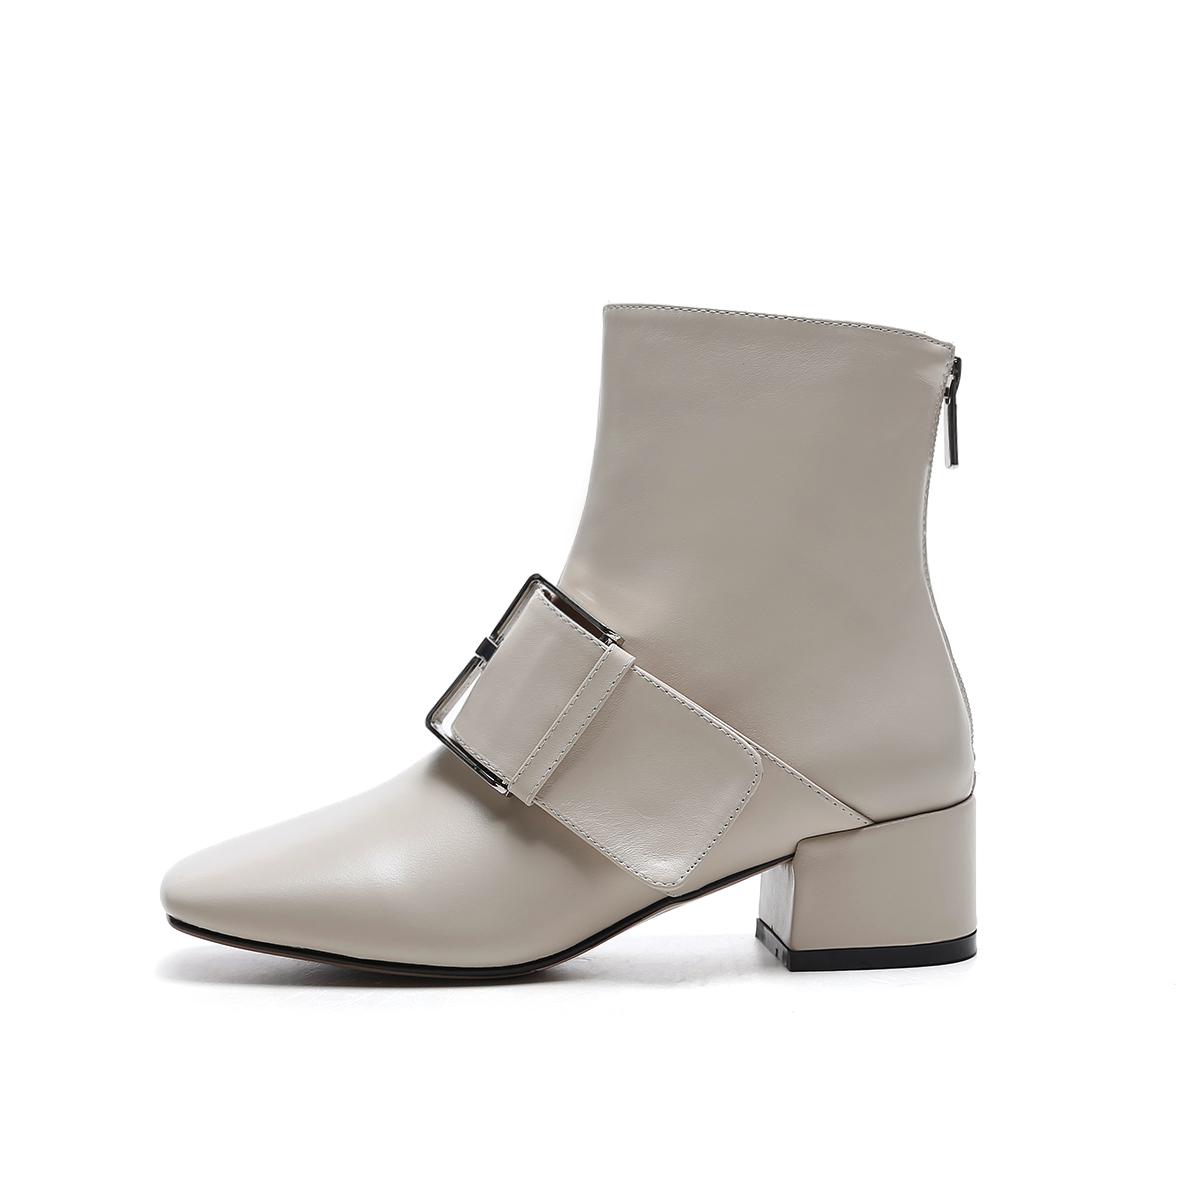 cd8776fa72f7 US  61 - Arden Furtado Size 34-40 Fashion Women Boots buckle Boots Ladies  Winter Ankle Boots square heels short boots - www.ardenfurtado.com